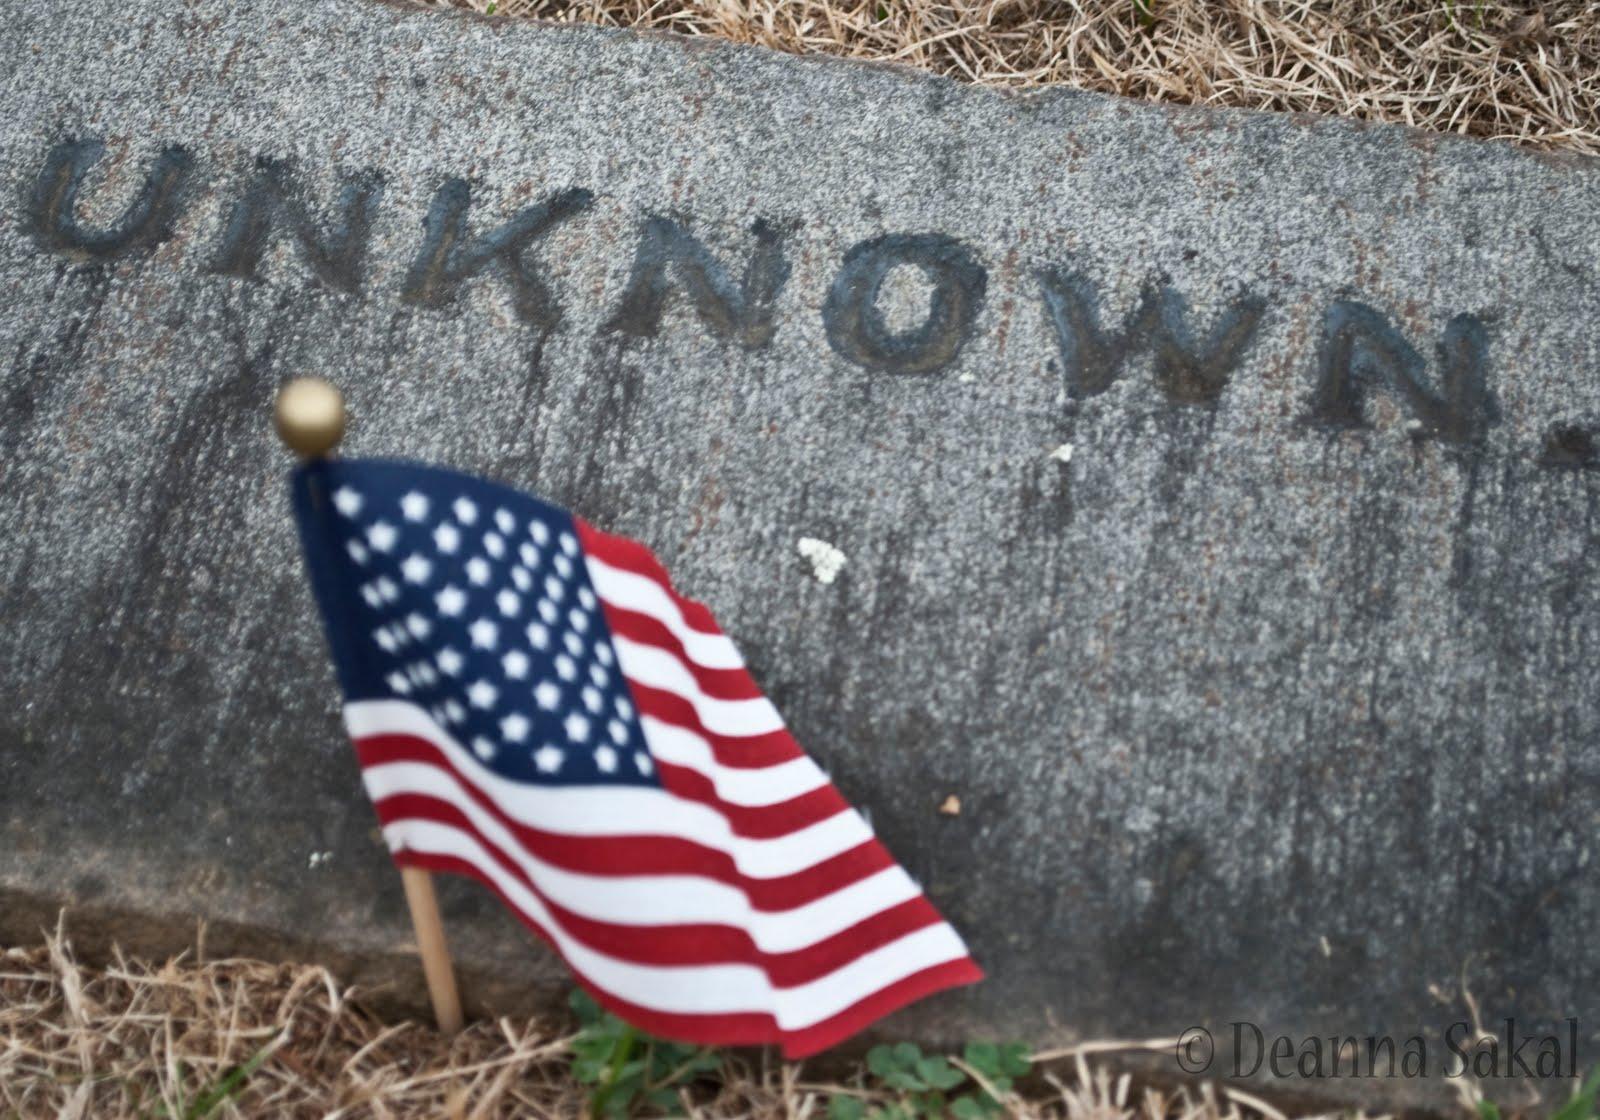 http://3.bp.blogspot.com/_QZIKCxNXRnw/TGCrttaOogI/AAAAAAAAAYs/9363WjMRuT8/s1600/Gettysburg3.jpg